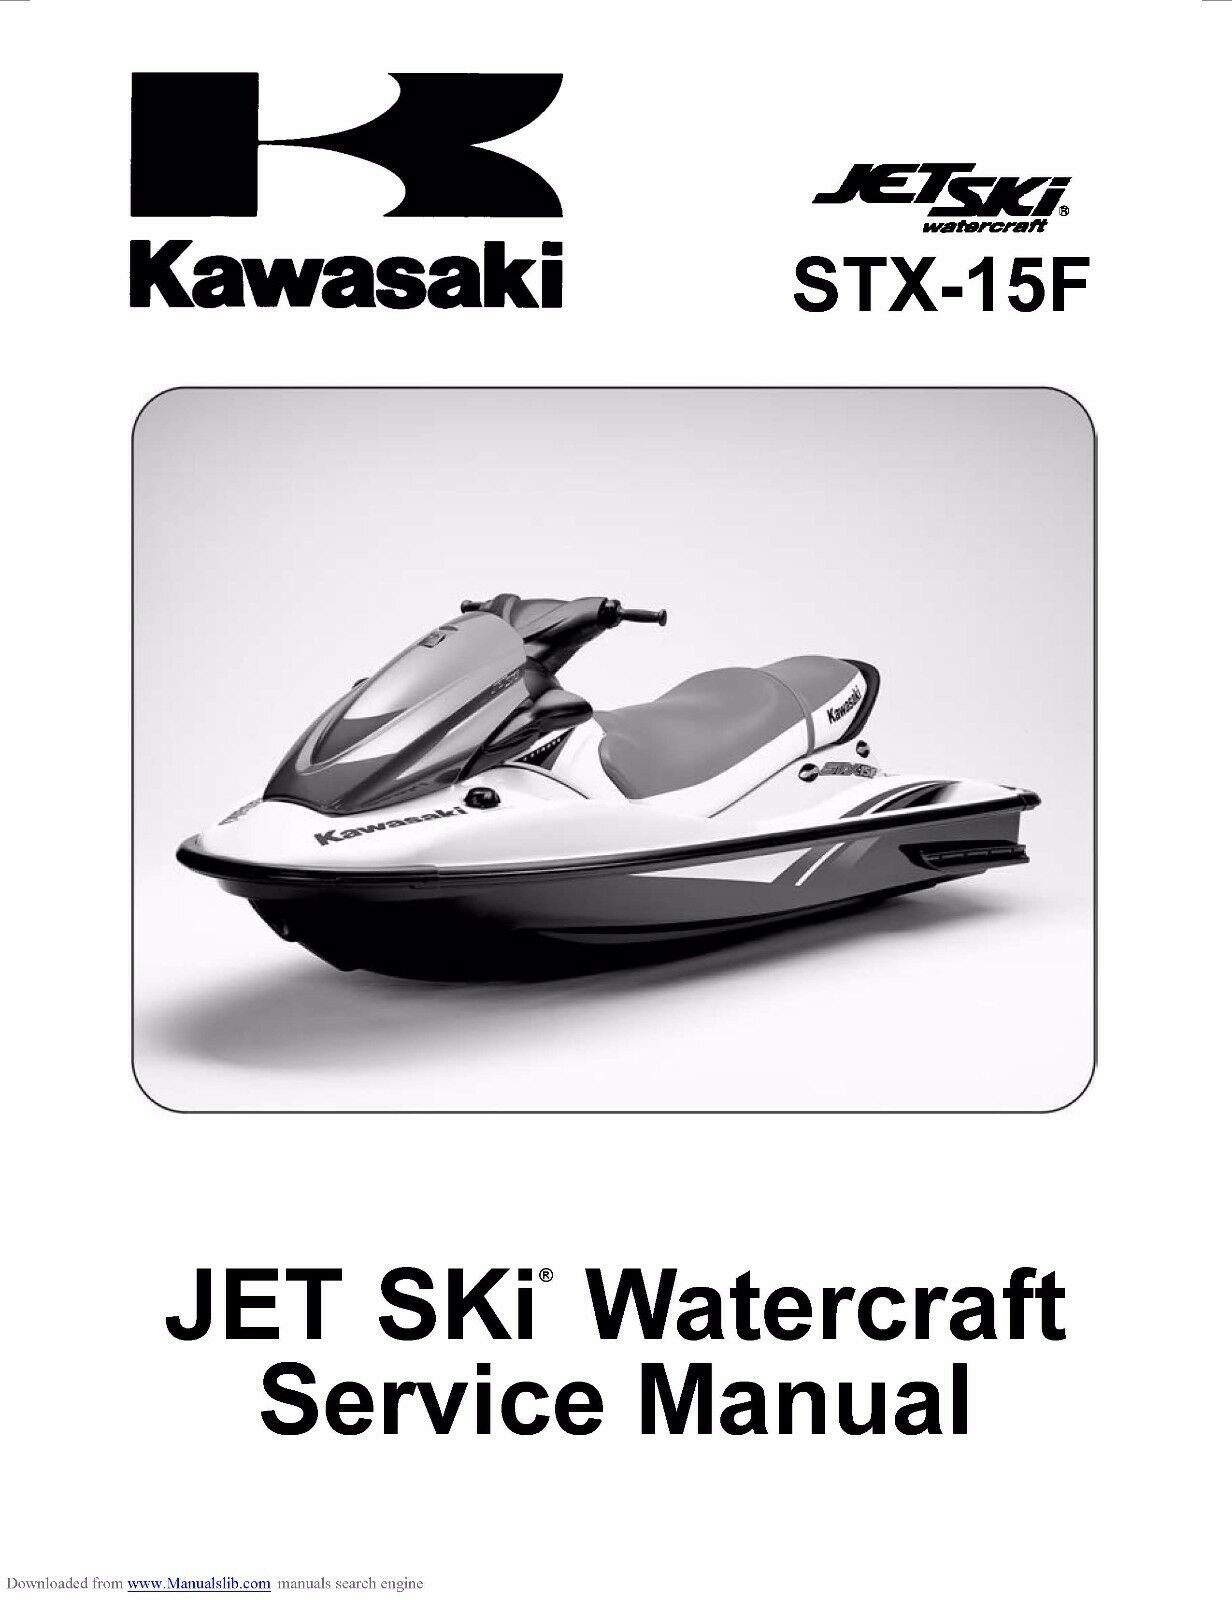 kawasaki jet ski stx 15f service repair manual 2004 2009 ebay rh ebay com Personal Watercraft Boat Watercraft Jet Ski Rental Bremer